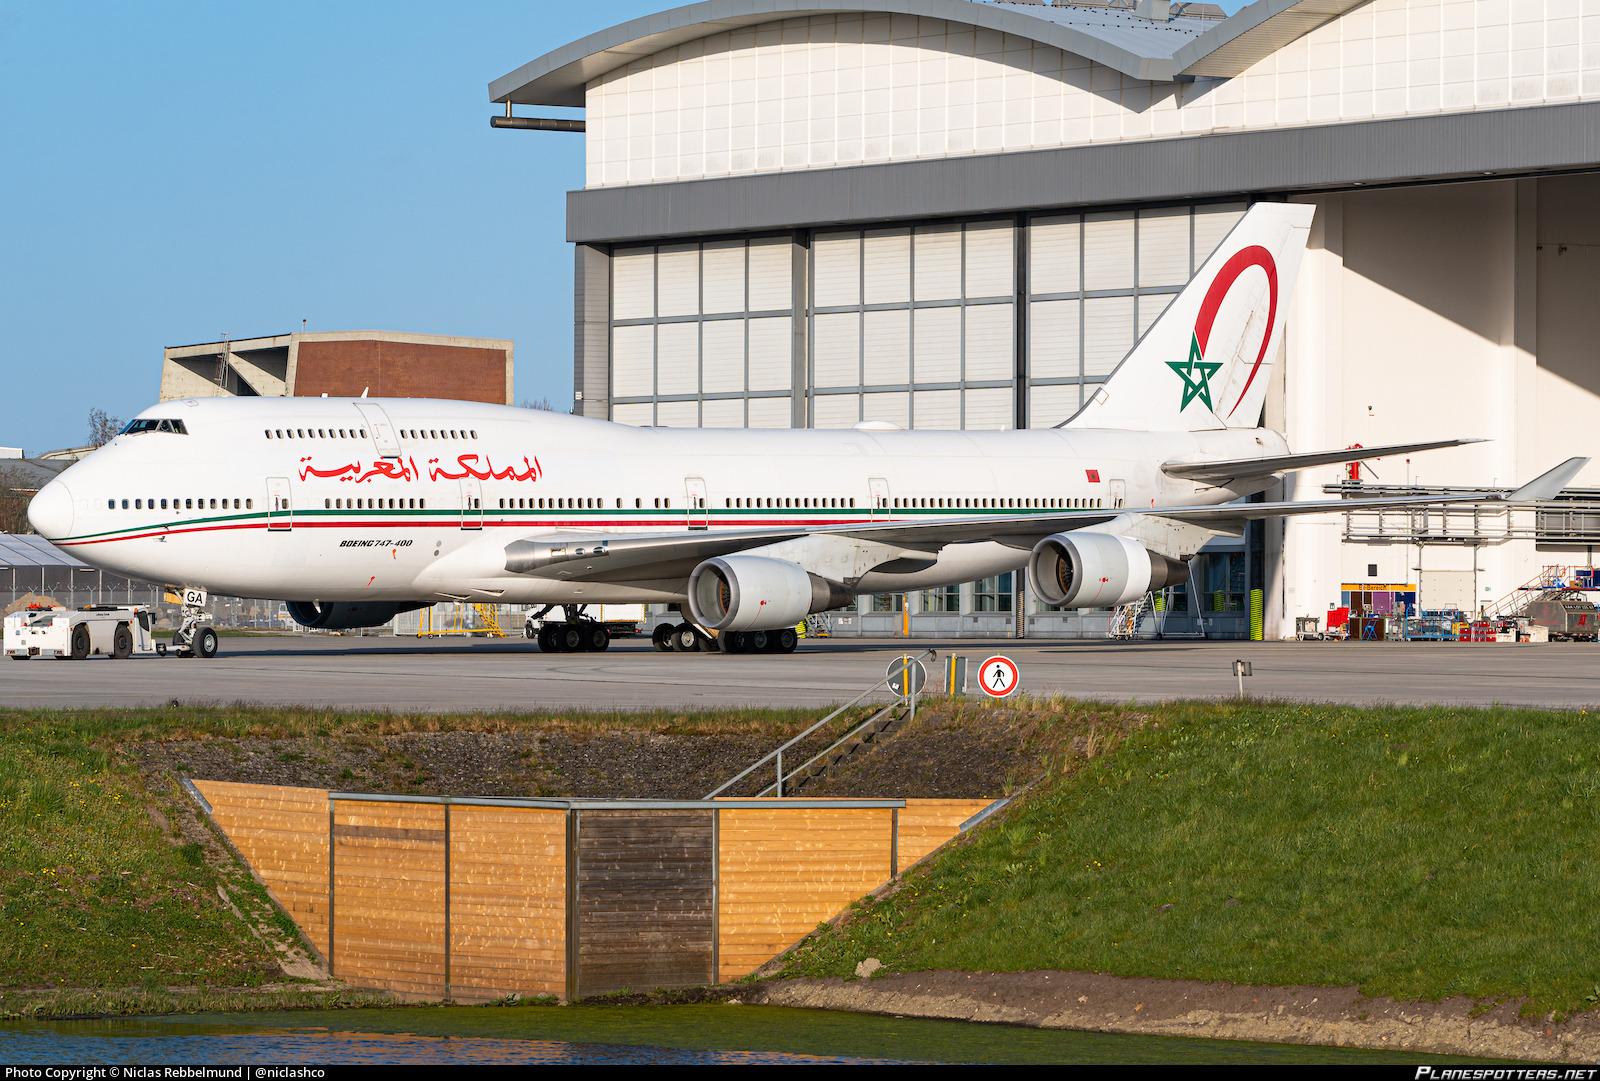 FRA: Avions VIP, Liaison & ECM - Page 24 Cn-rga-morocco-government-boeing-747-428_PlanespottersNet_1066771_e05b7cfdc1_o